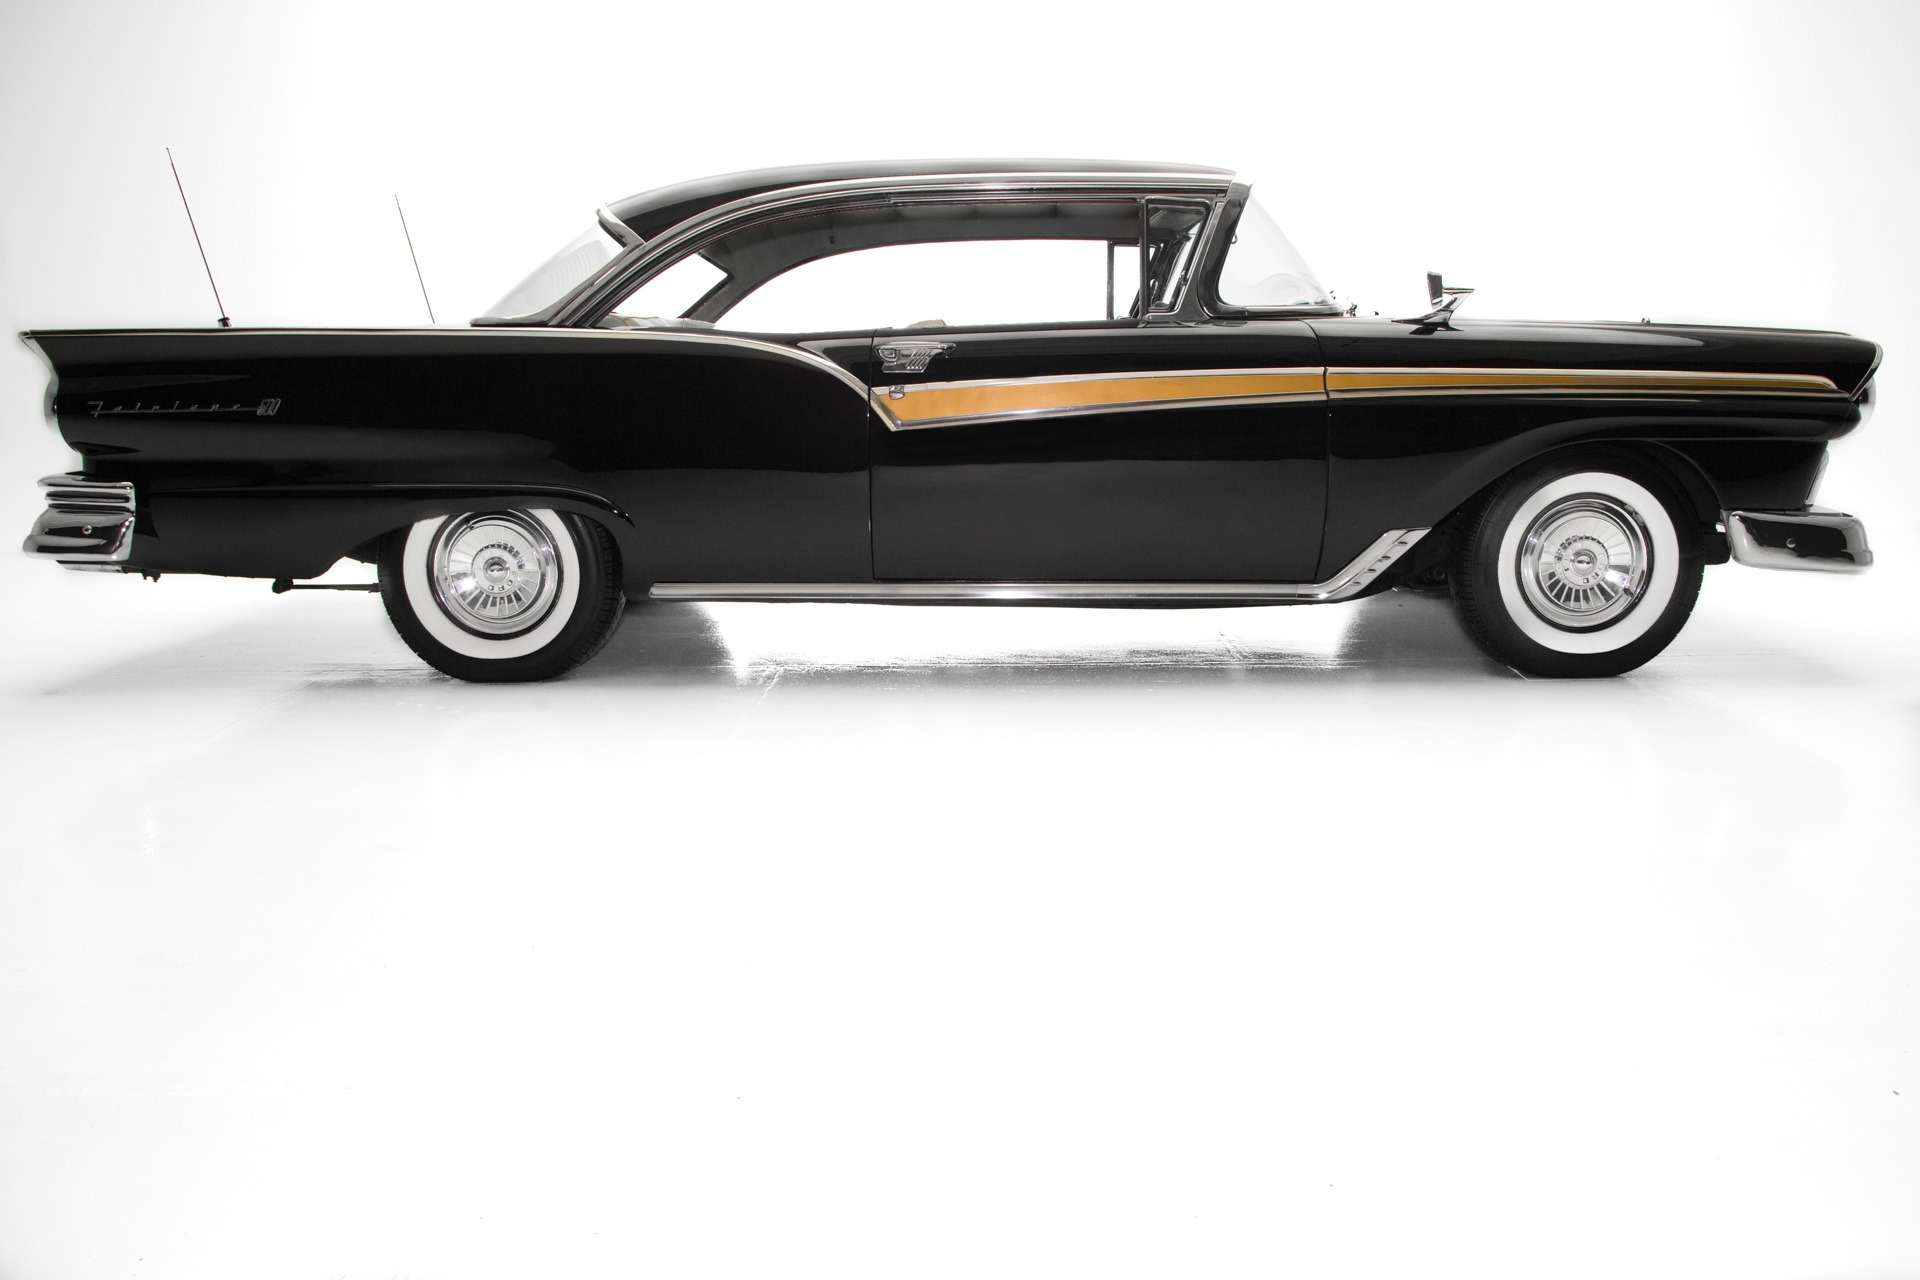 Photo 1957 Ford Fairlane 500 Black on Black , V8 Show Chrome, WHOLESALE CLEARANCE PRICED 27900